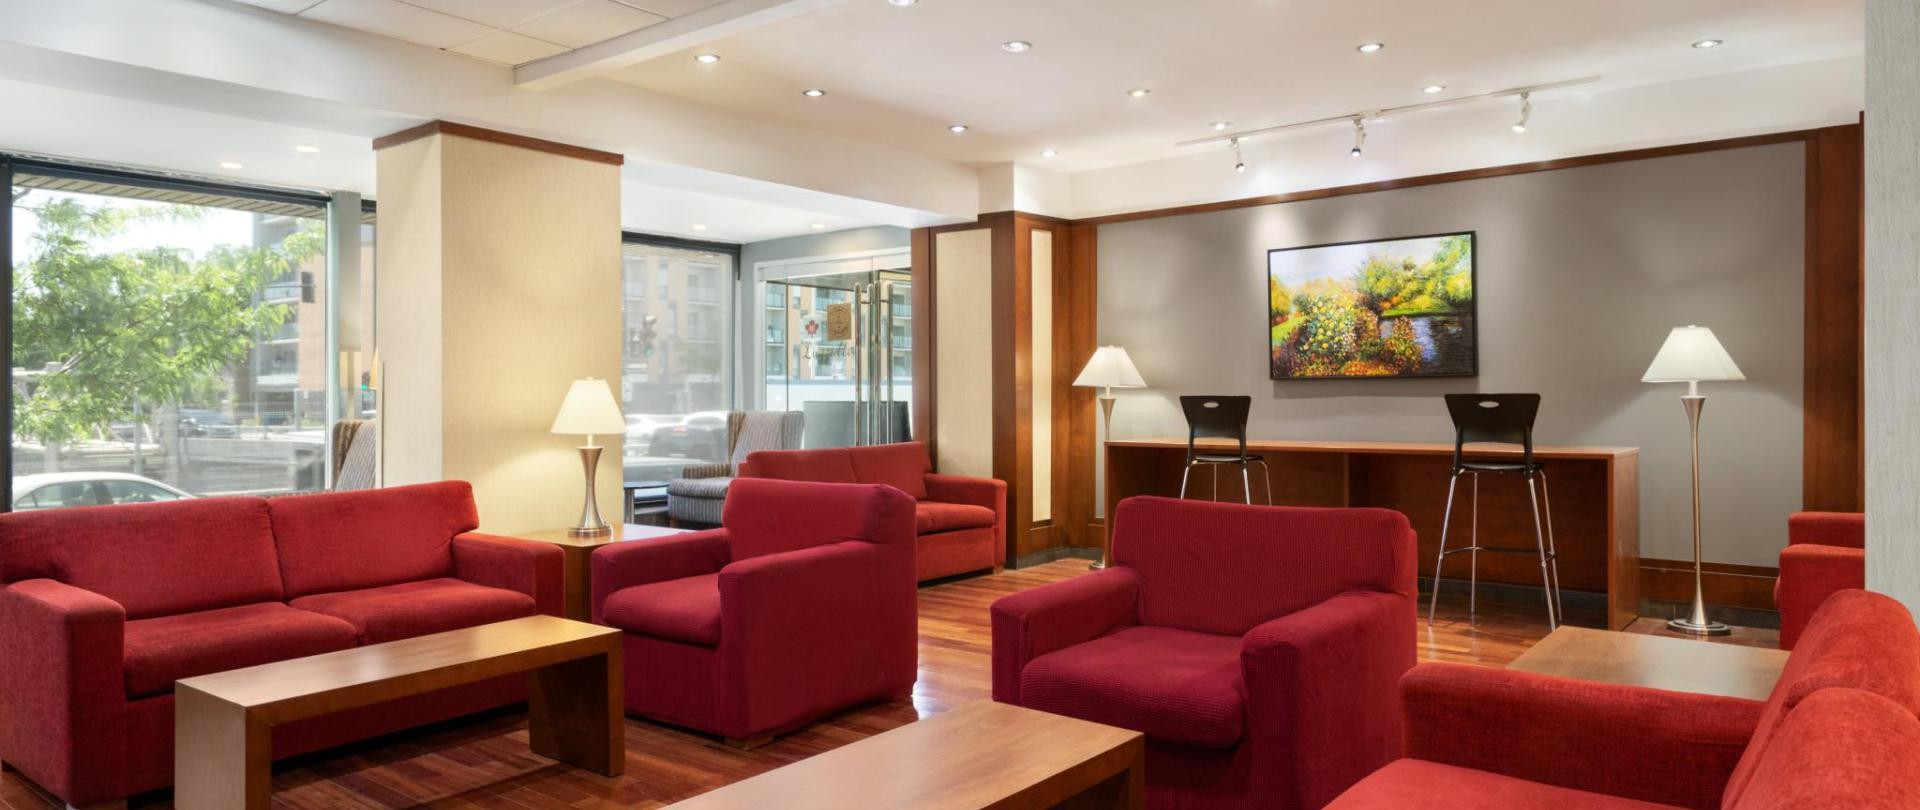 Ramada Montreal - Lobby - 1284201.jpg